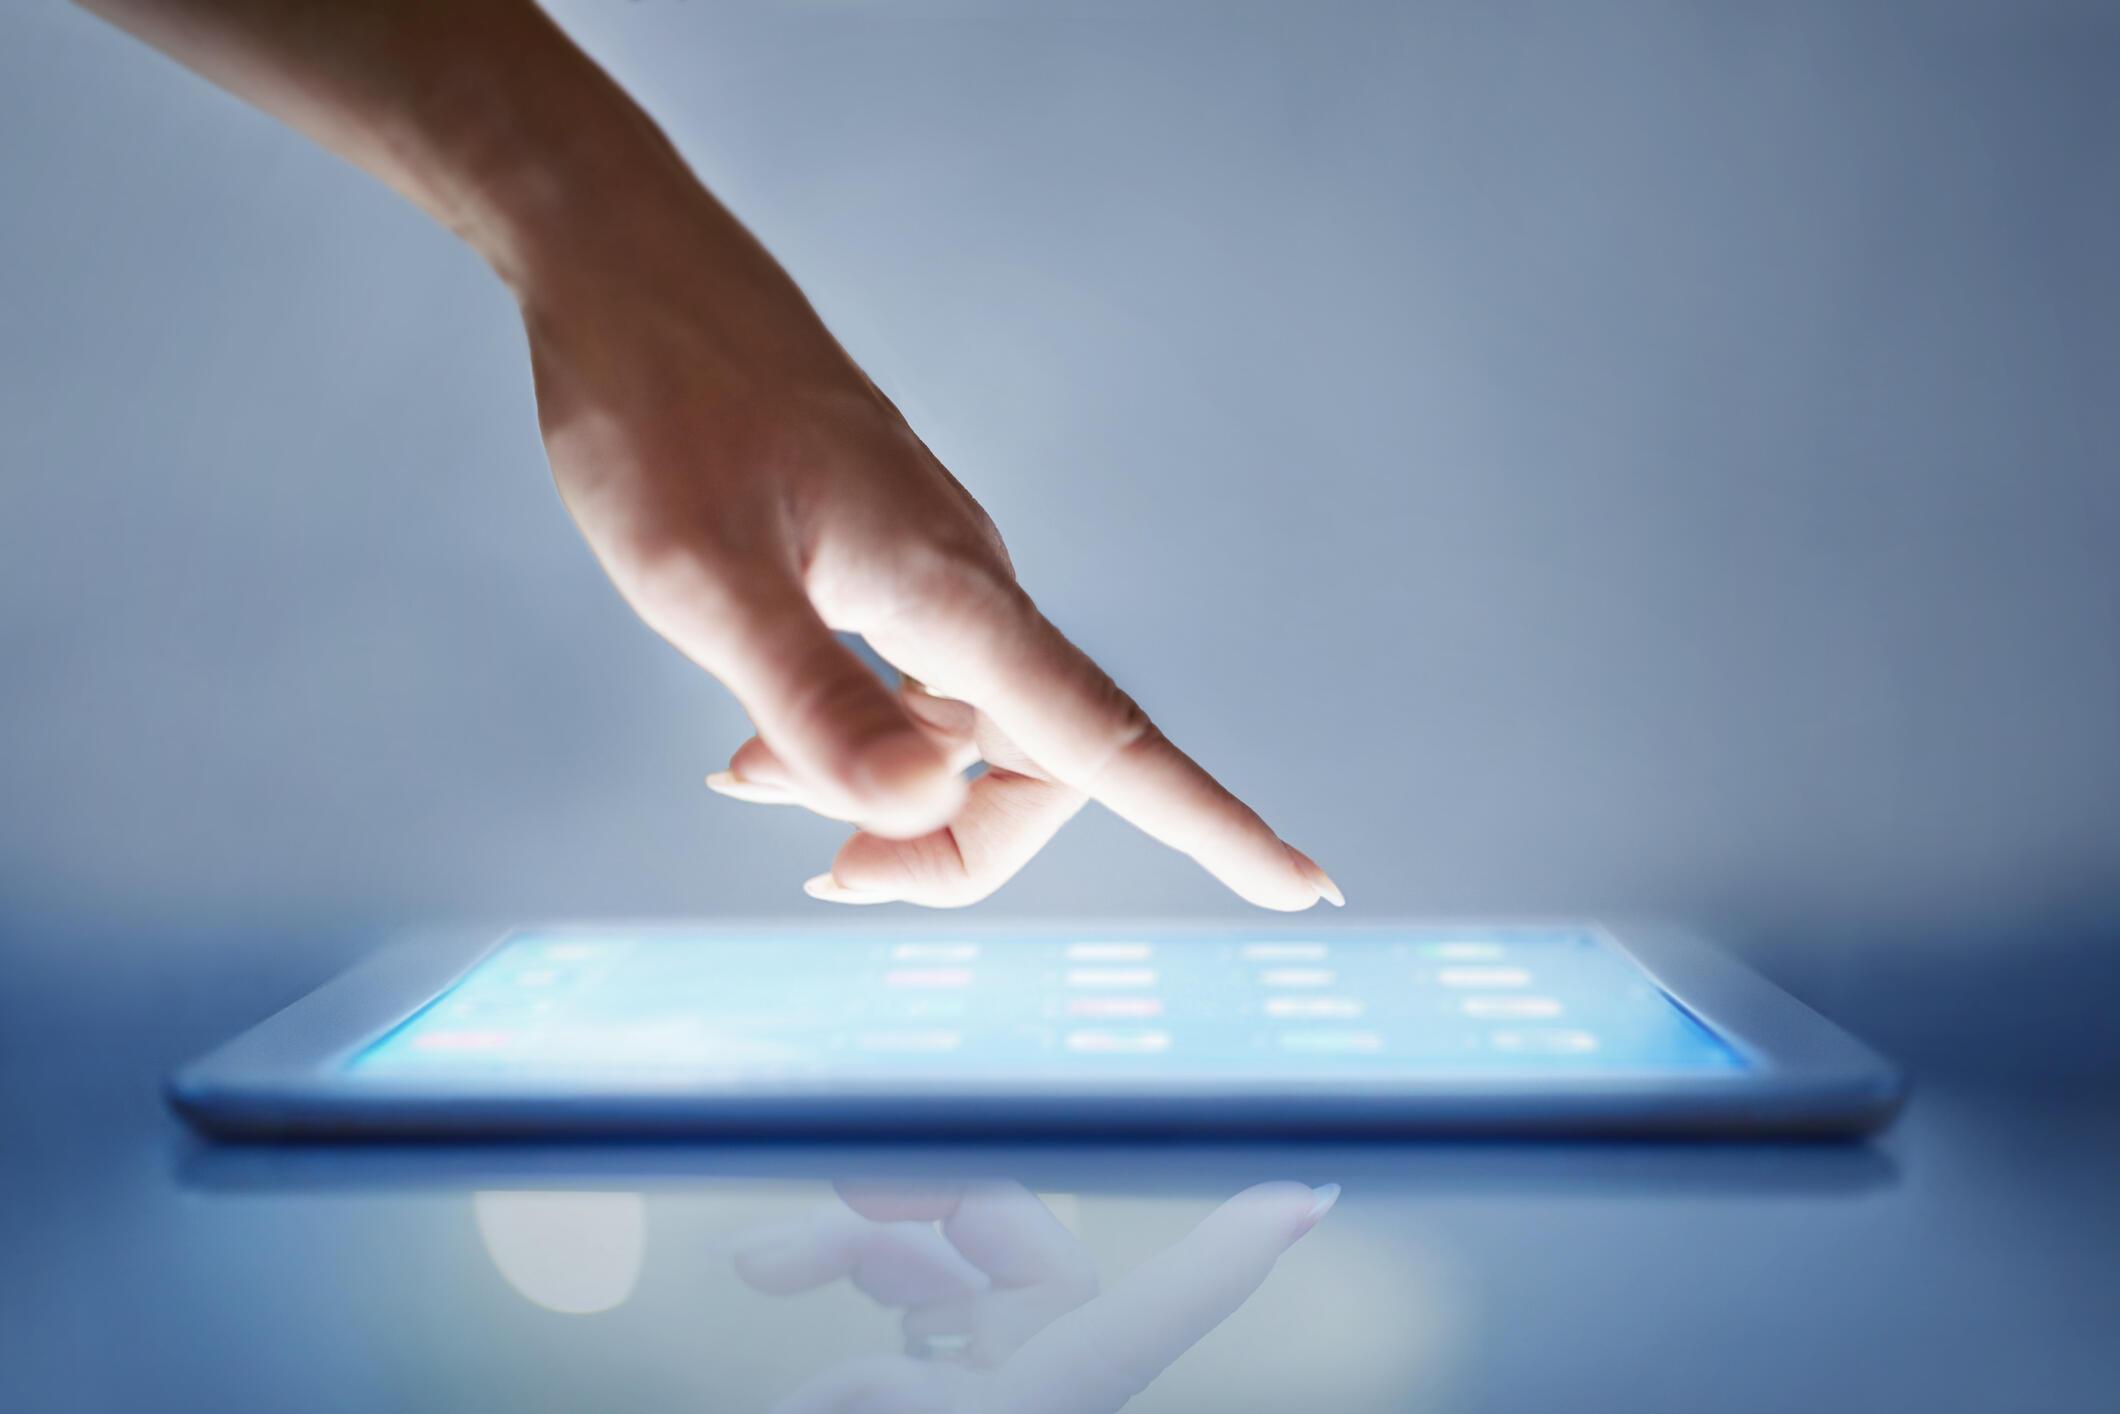 New York Prisoners Getting Free Tablets | News Radio 810